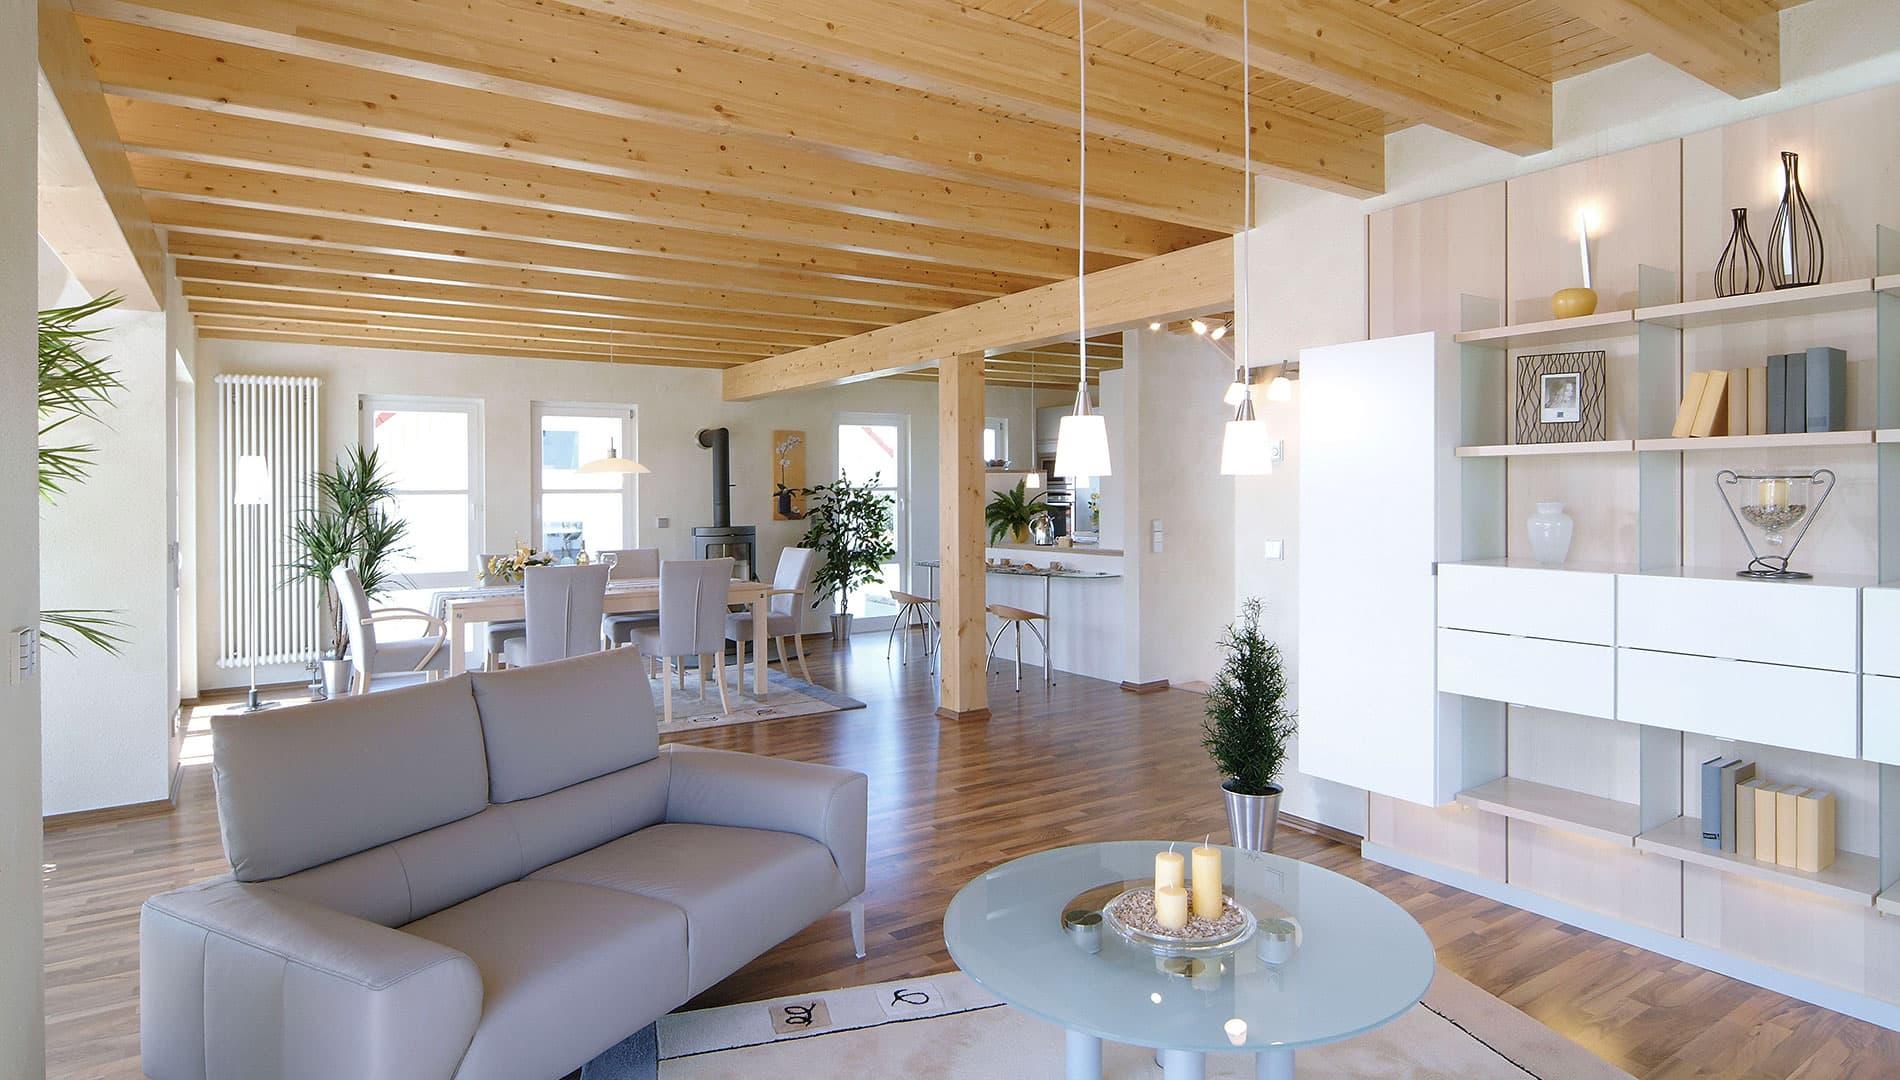 fertighaus weiss musterhaus vision in oberrot. Black Bedroom Furniture Sets. Home Design Ideas